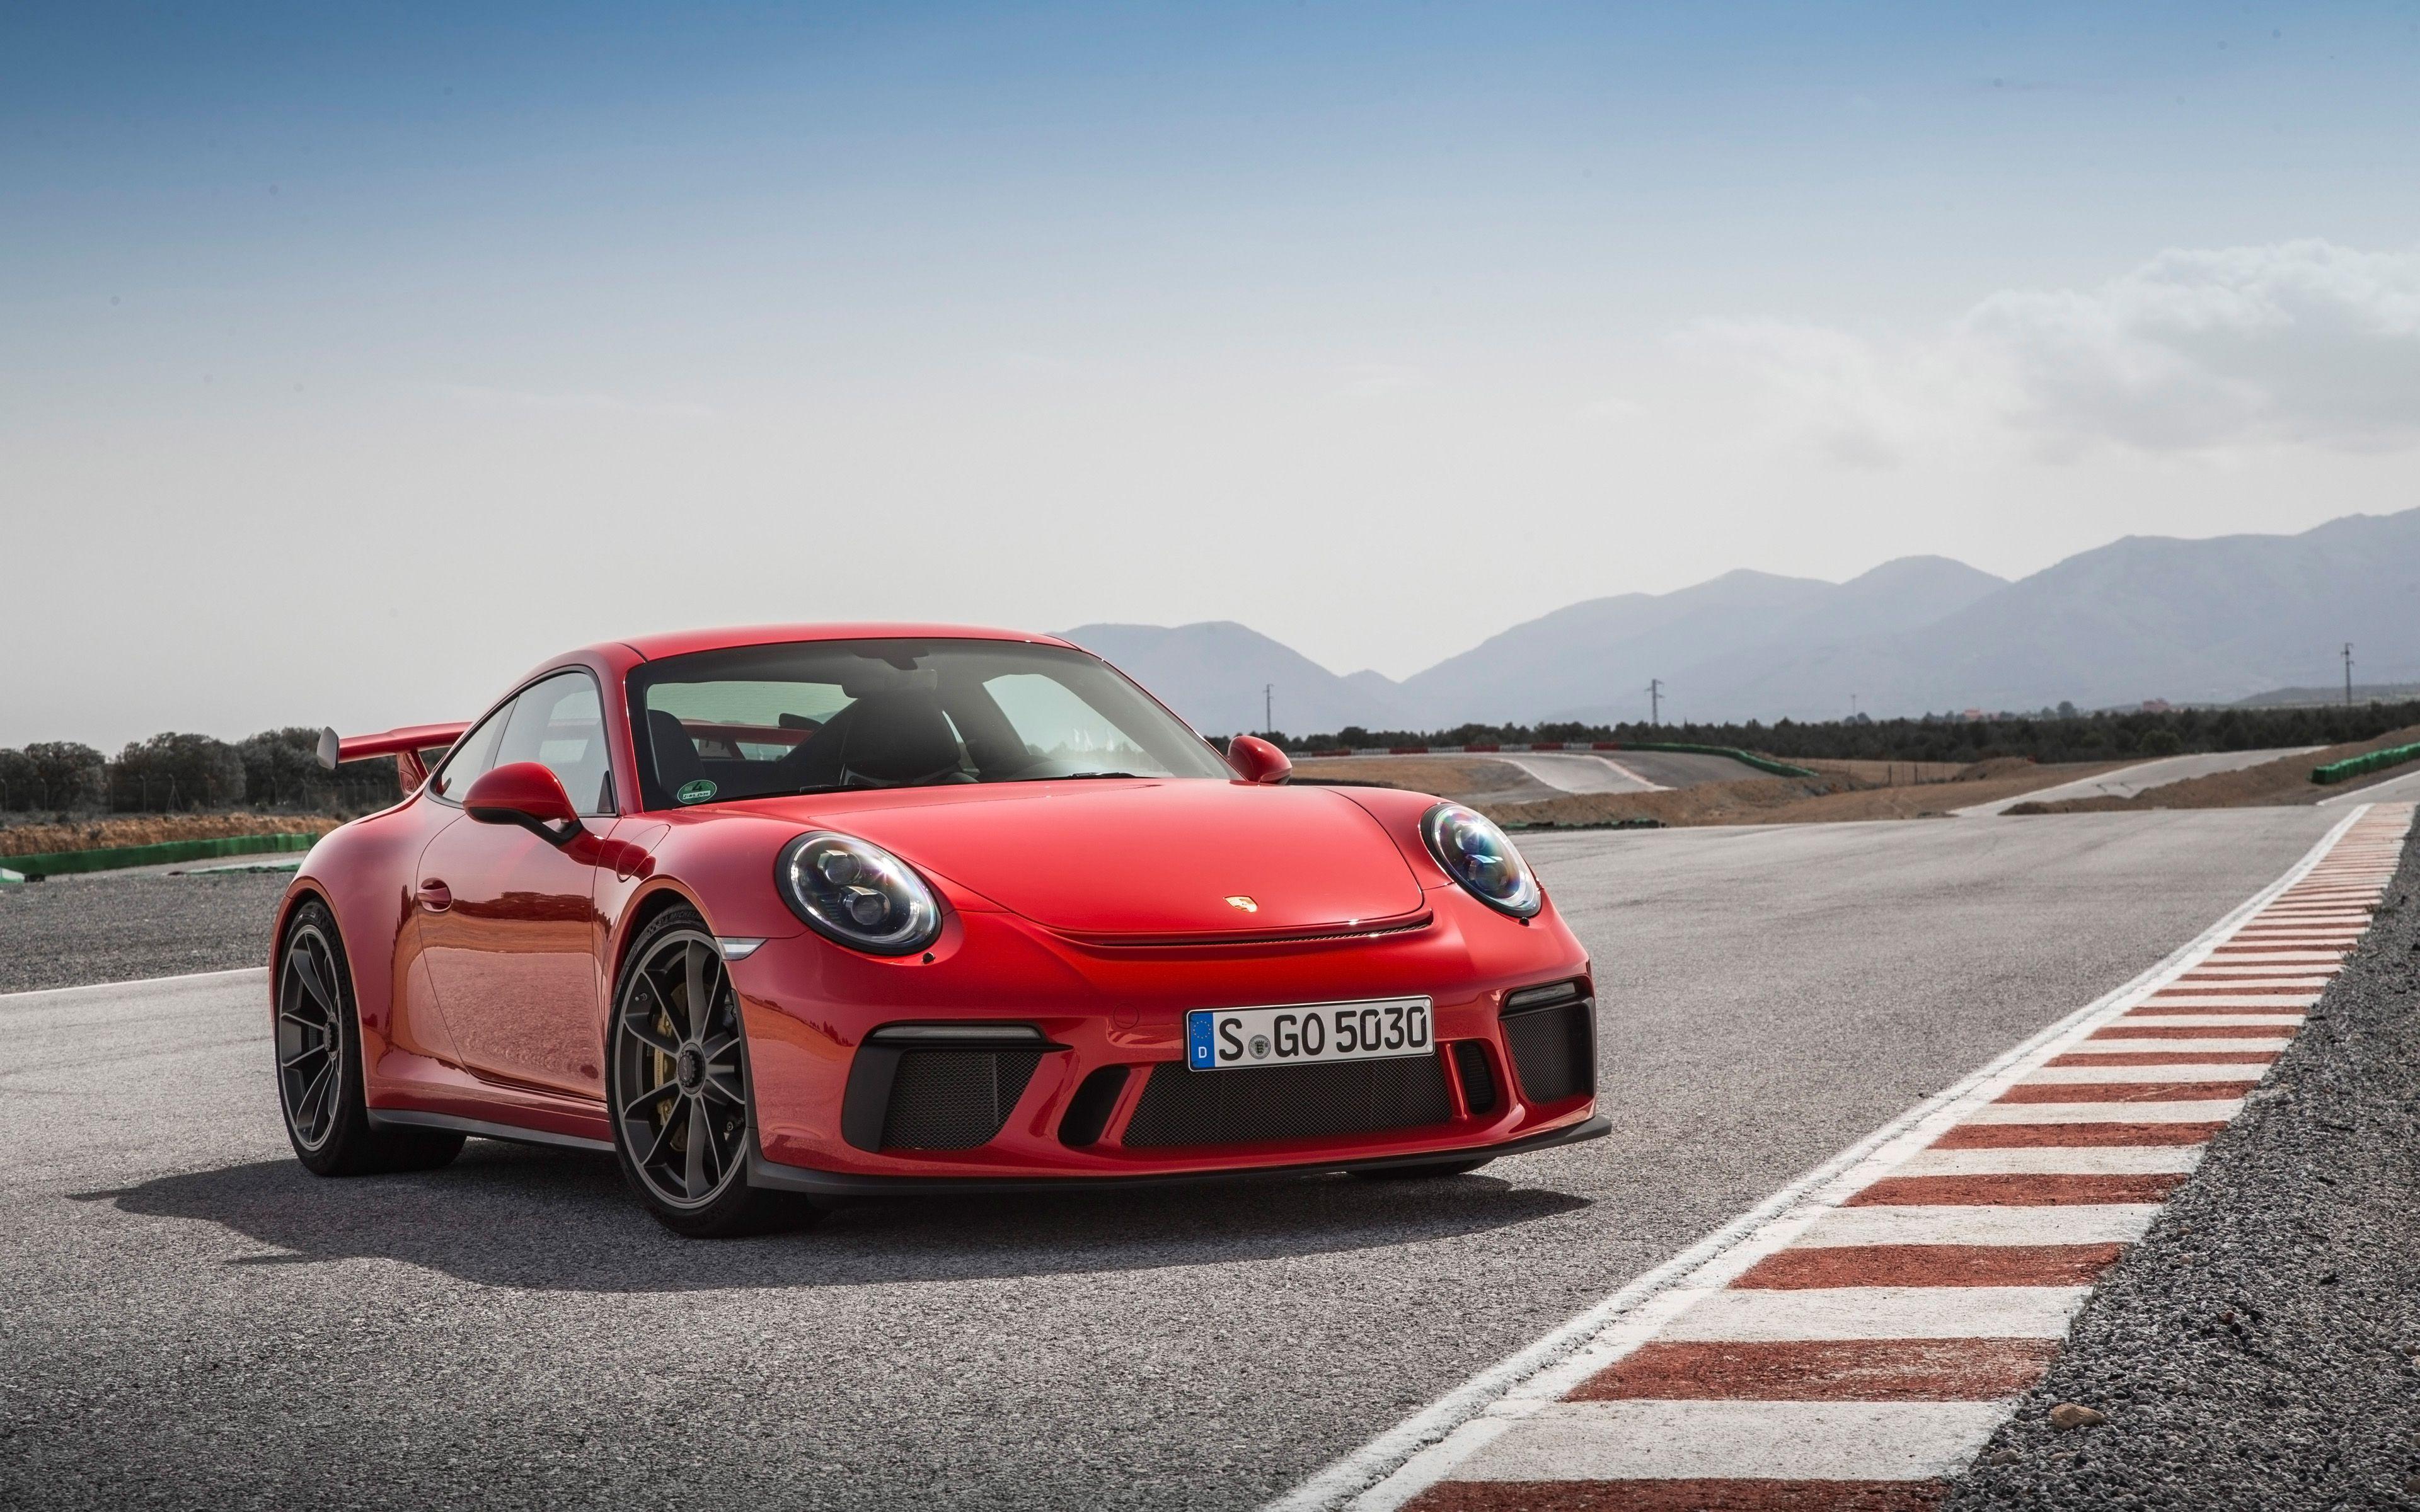 Red Porsche Wallpapers   Top Red Porsche Backgrounds 3840x2400